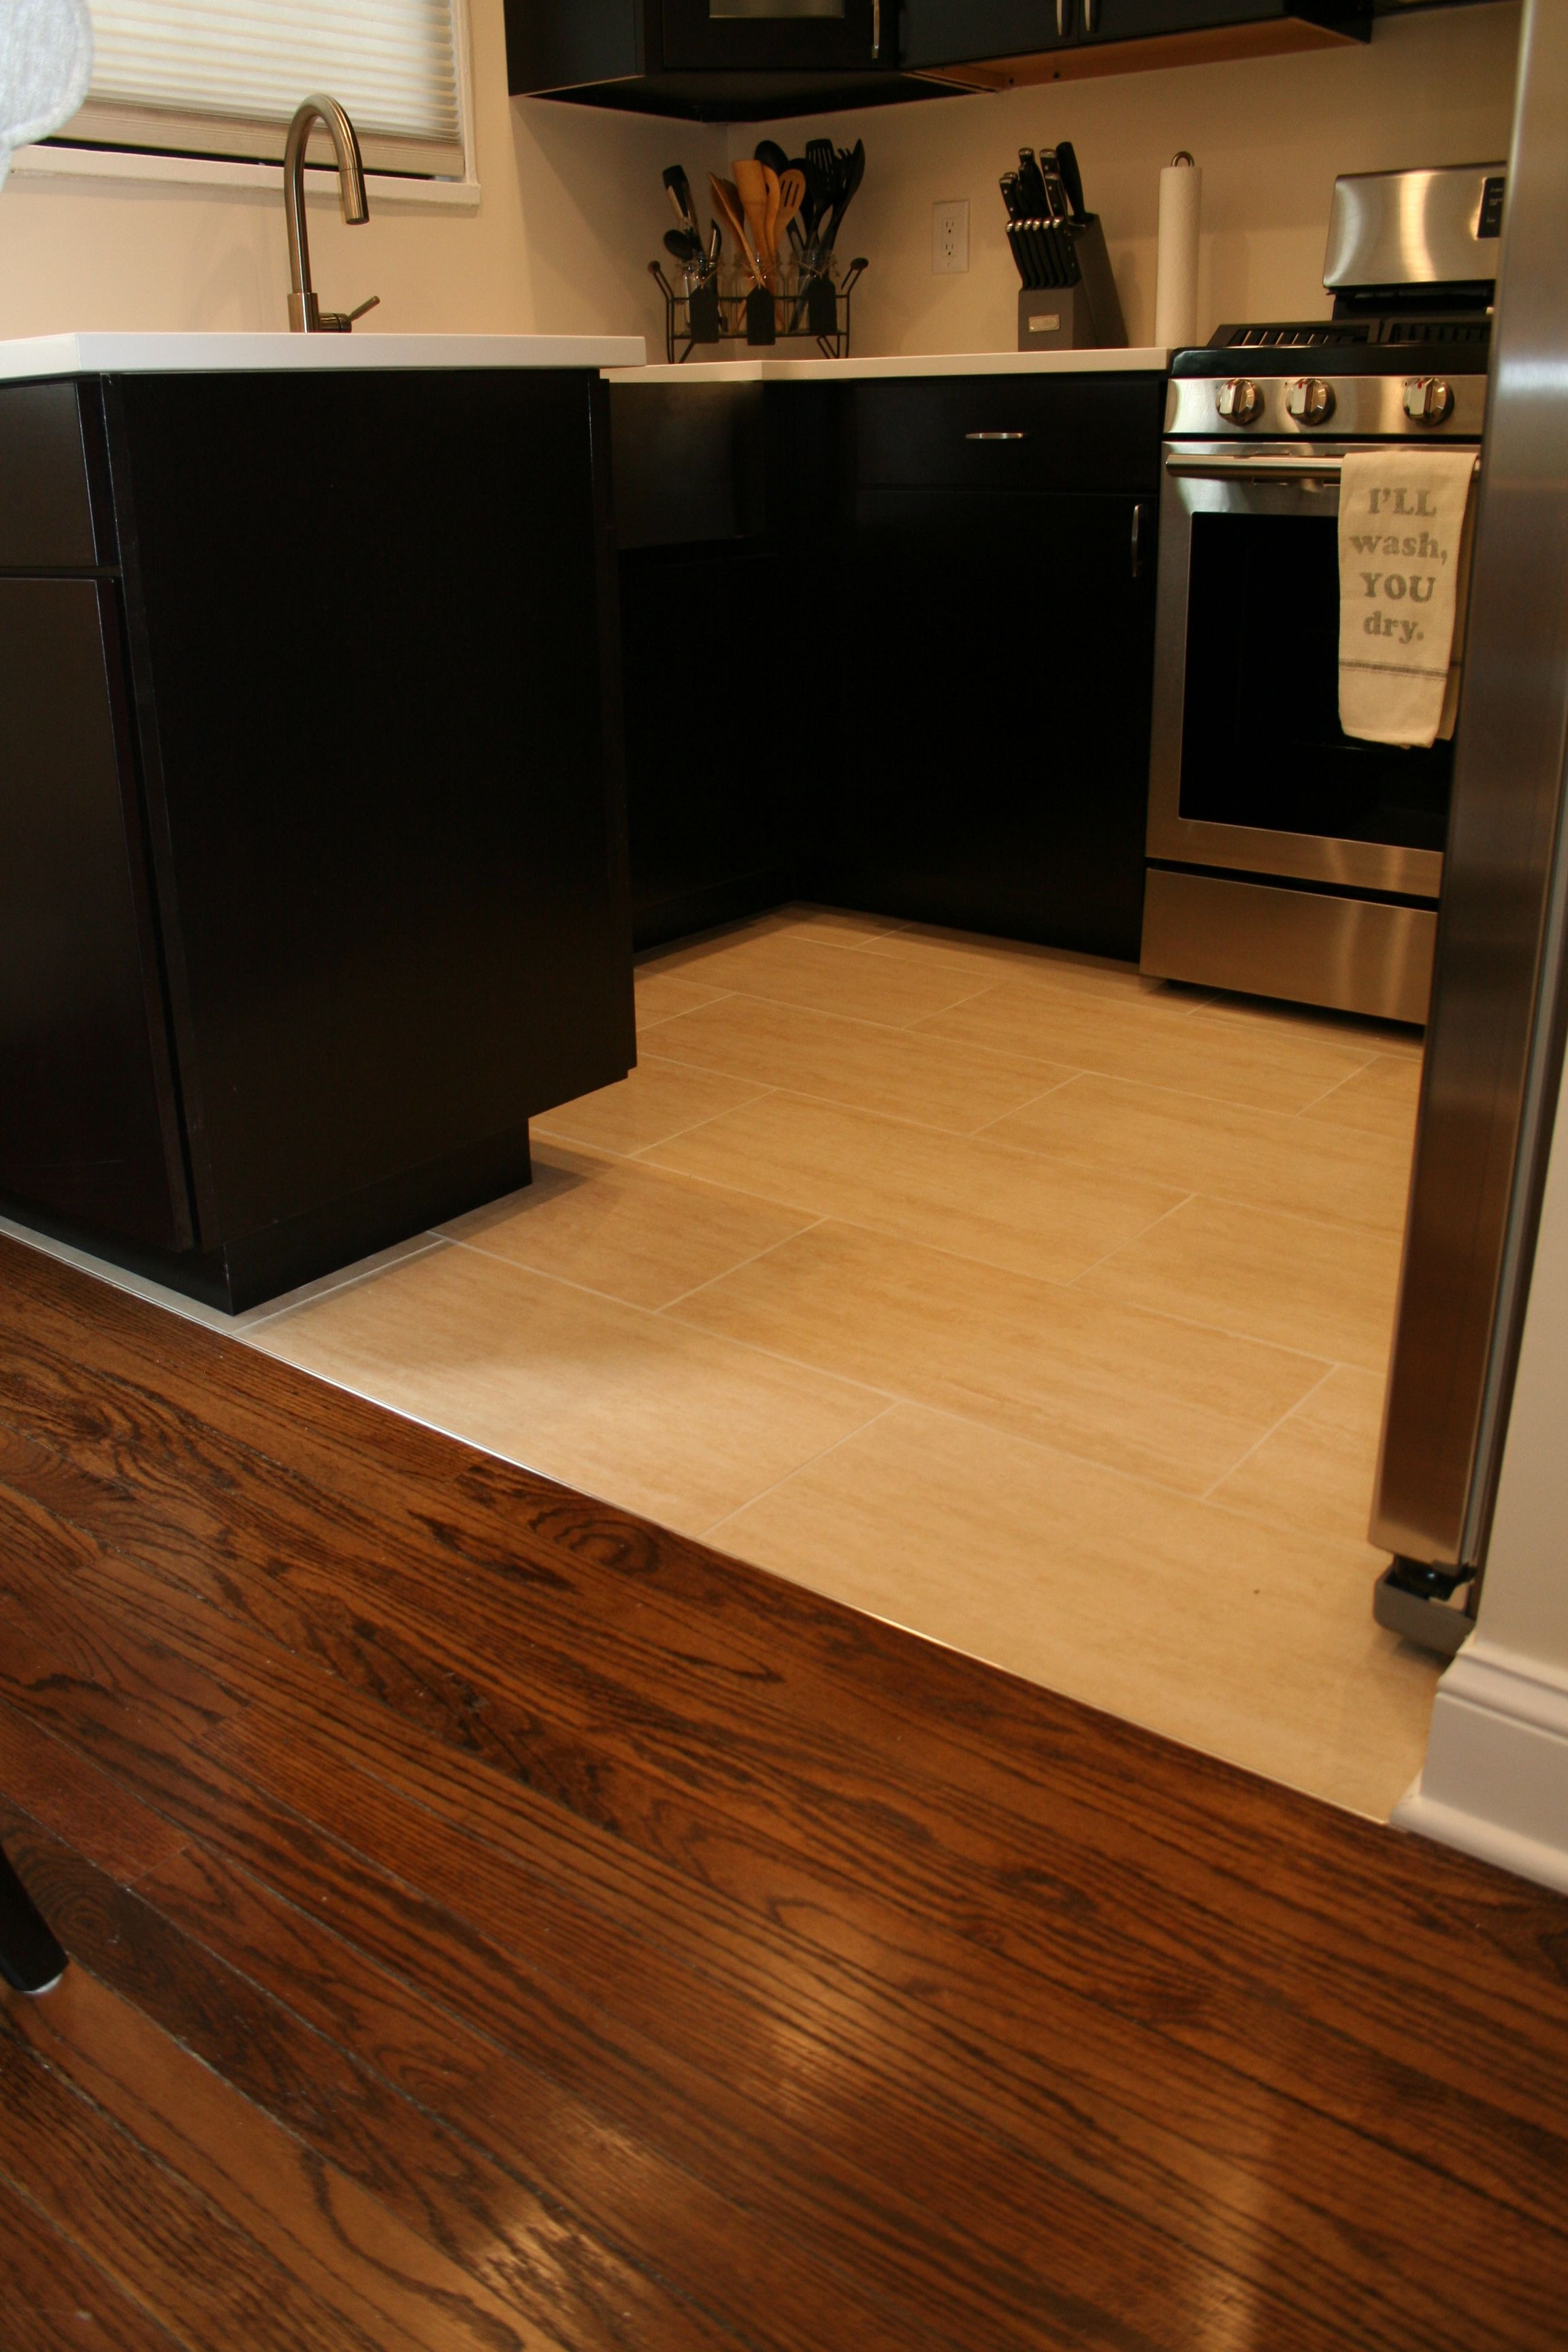 bamboo hardwood flooring durability of pin by kabinet king on our work pinterest flooring tiles and with dark wood floors beautiful dark wood floors love the dark bamboo floors and pewter walls